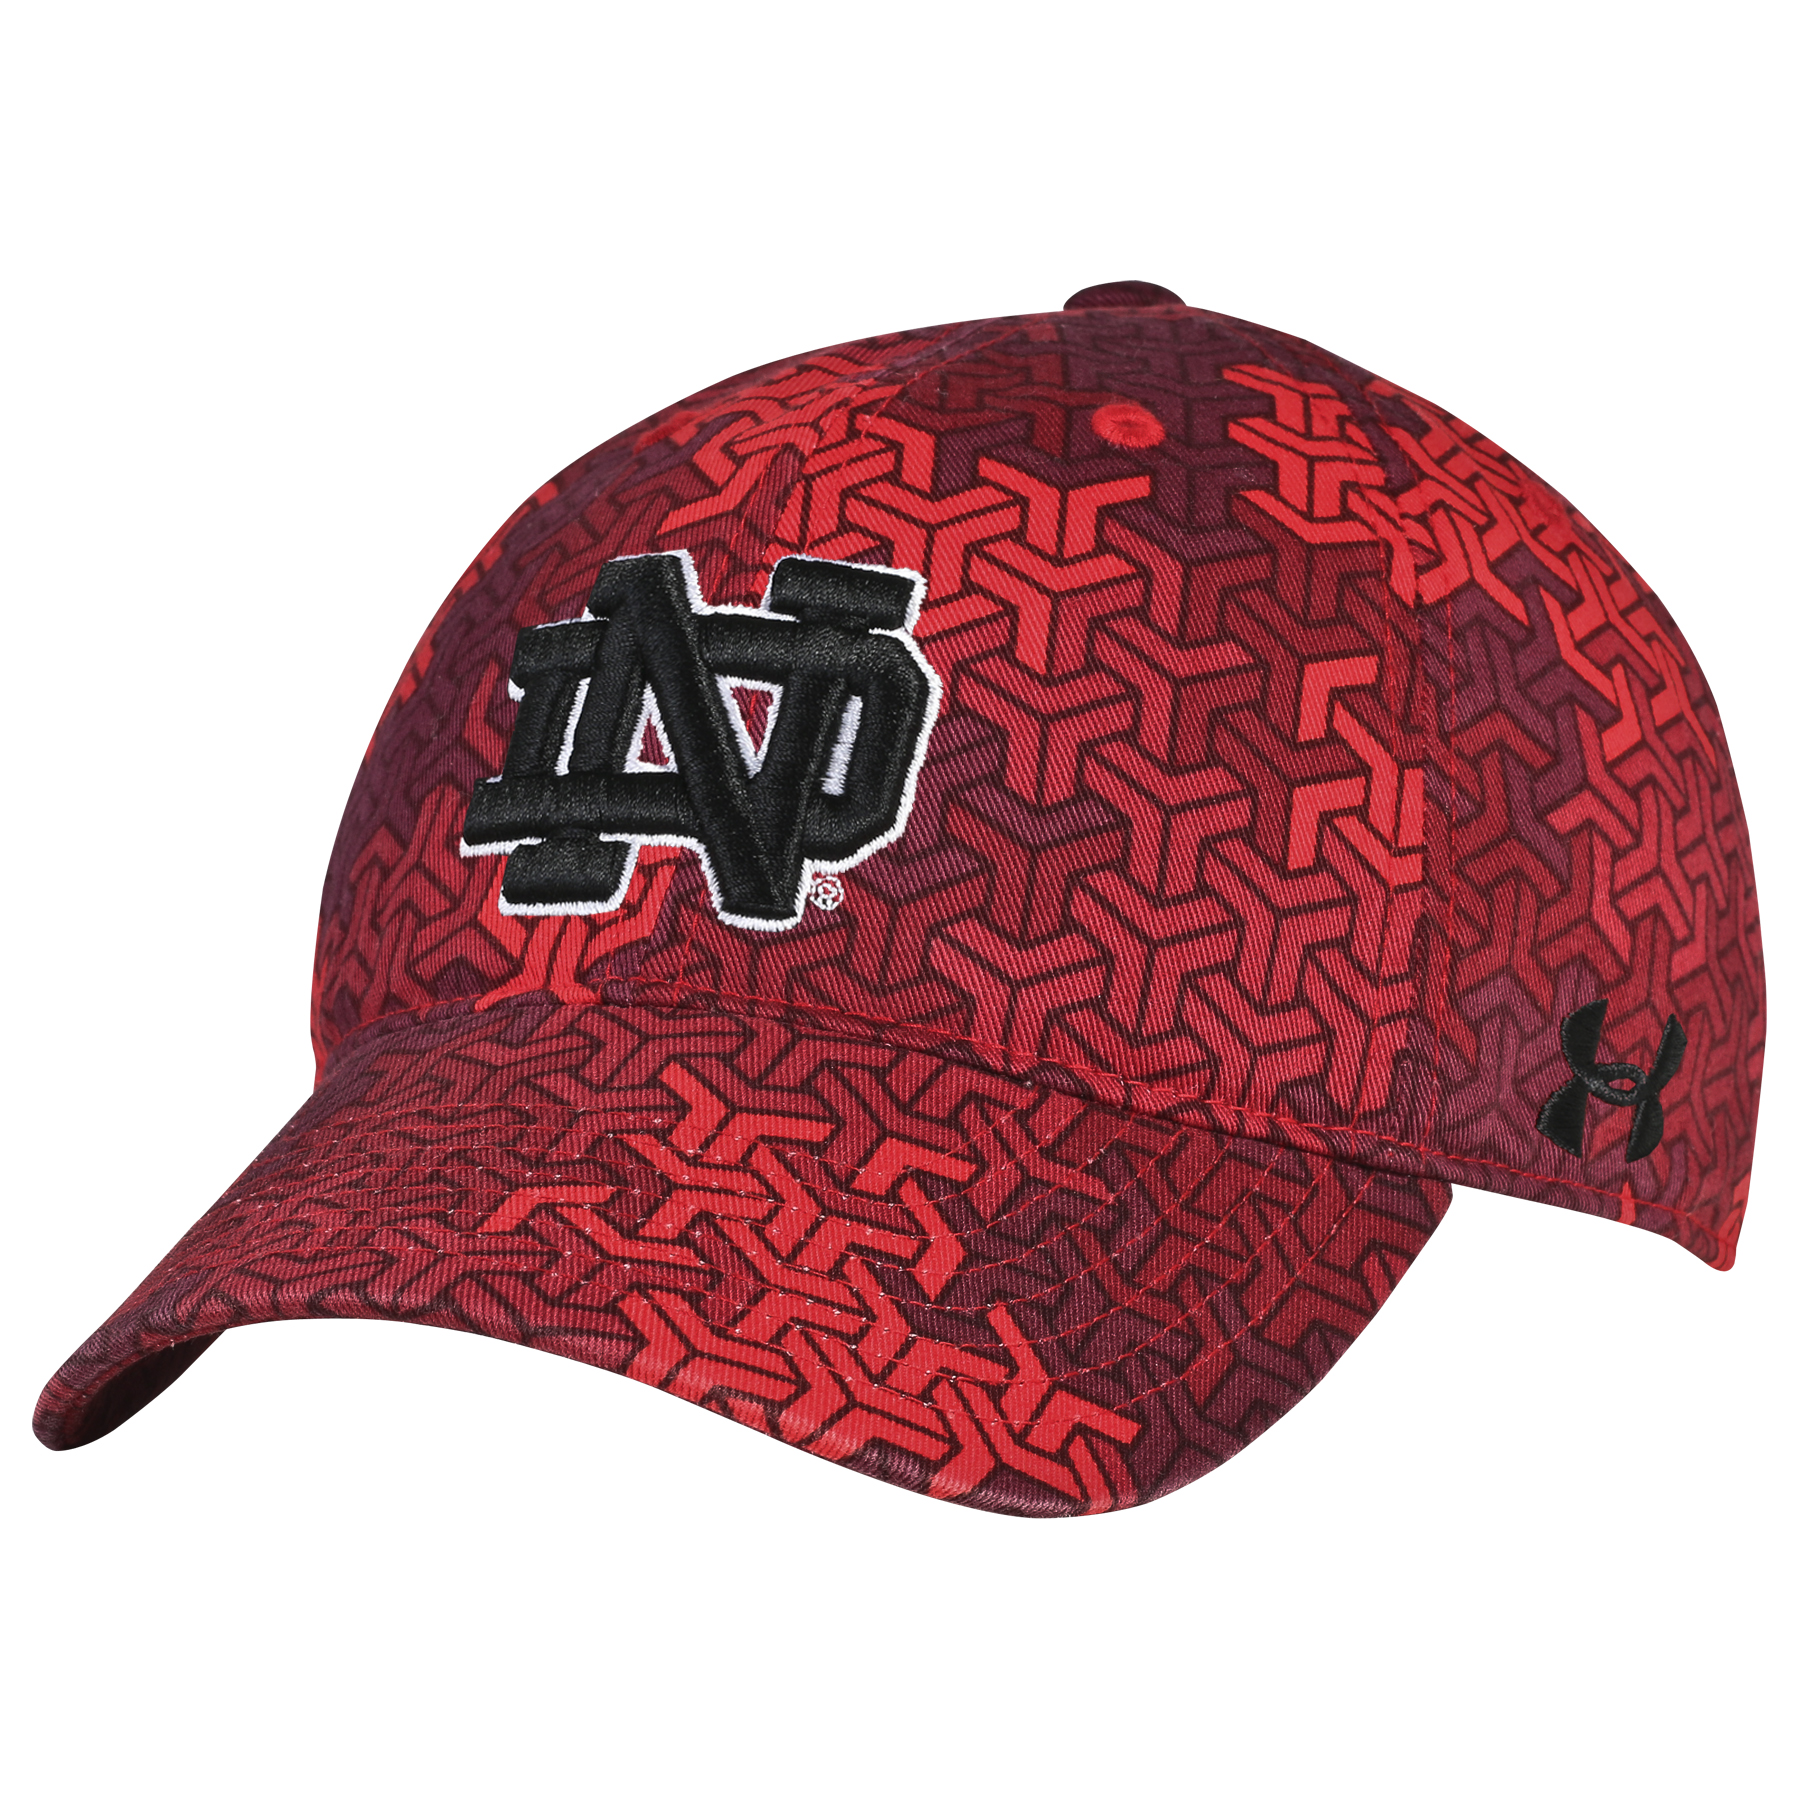 timeless design 1f100 c2de2 Notre Dame Fighting Irish Under Armour Youth Signal Caller HeatGear Adj Hat  Cap